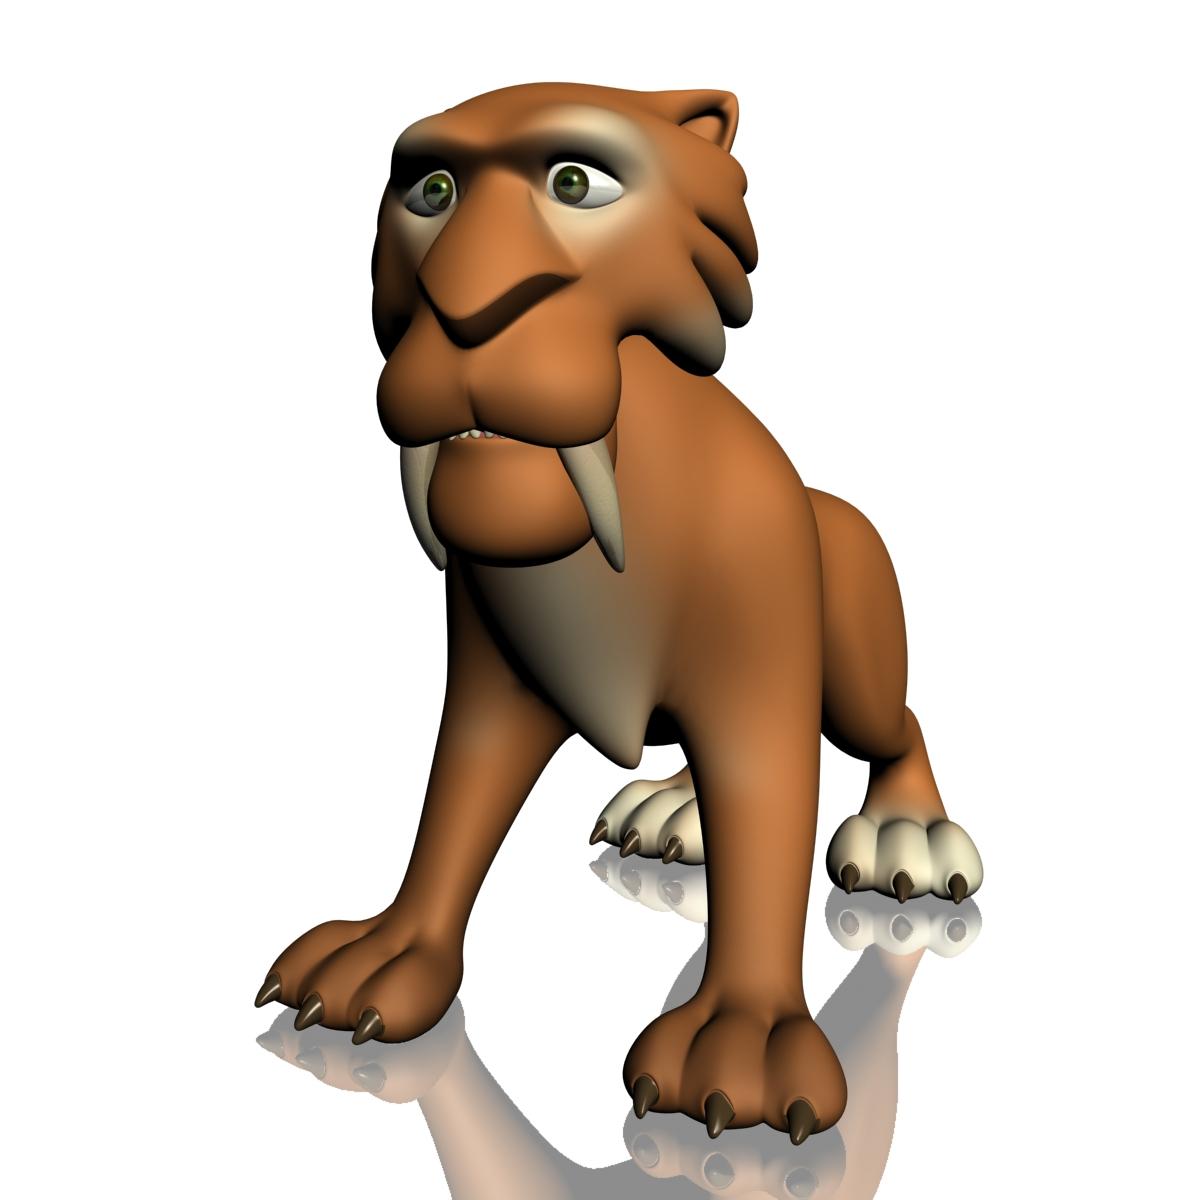 cartoon sabertooth tiger rigged 3d model buy cartoon sabertooth rh flatpyramid com cartoon sabre tooth tiger Cartoon Monkey